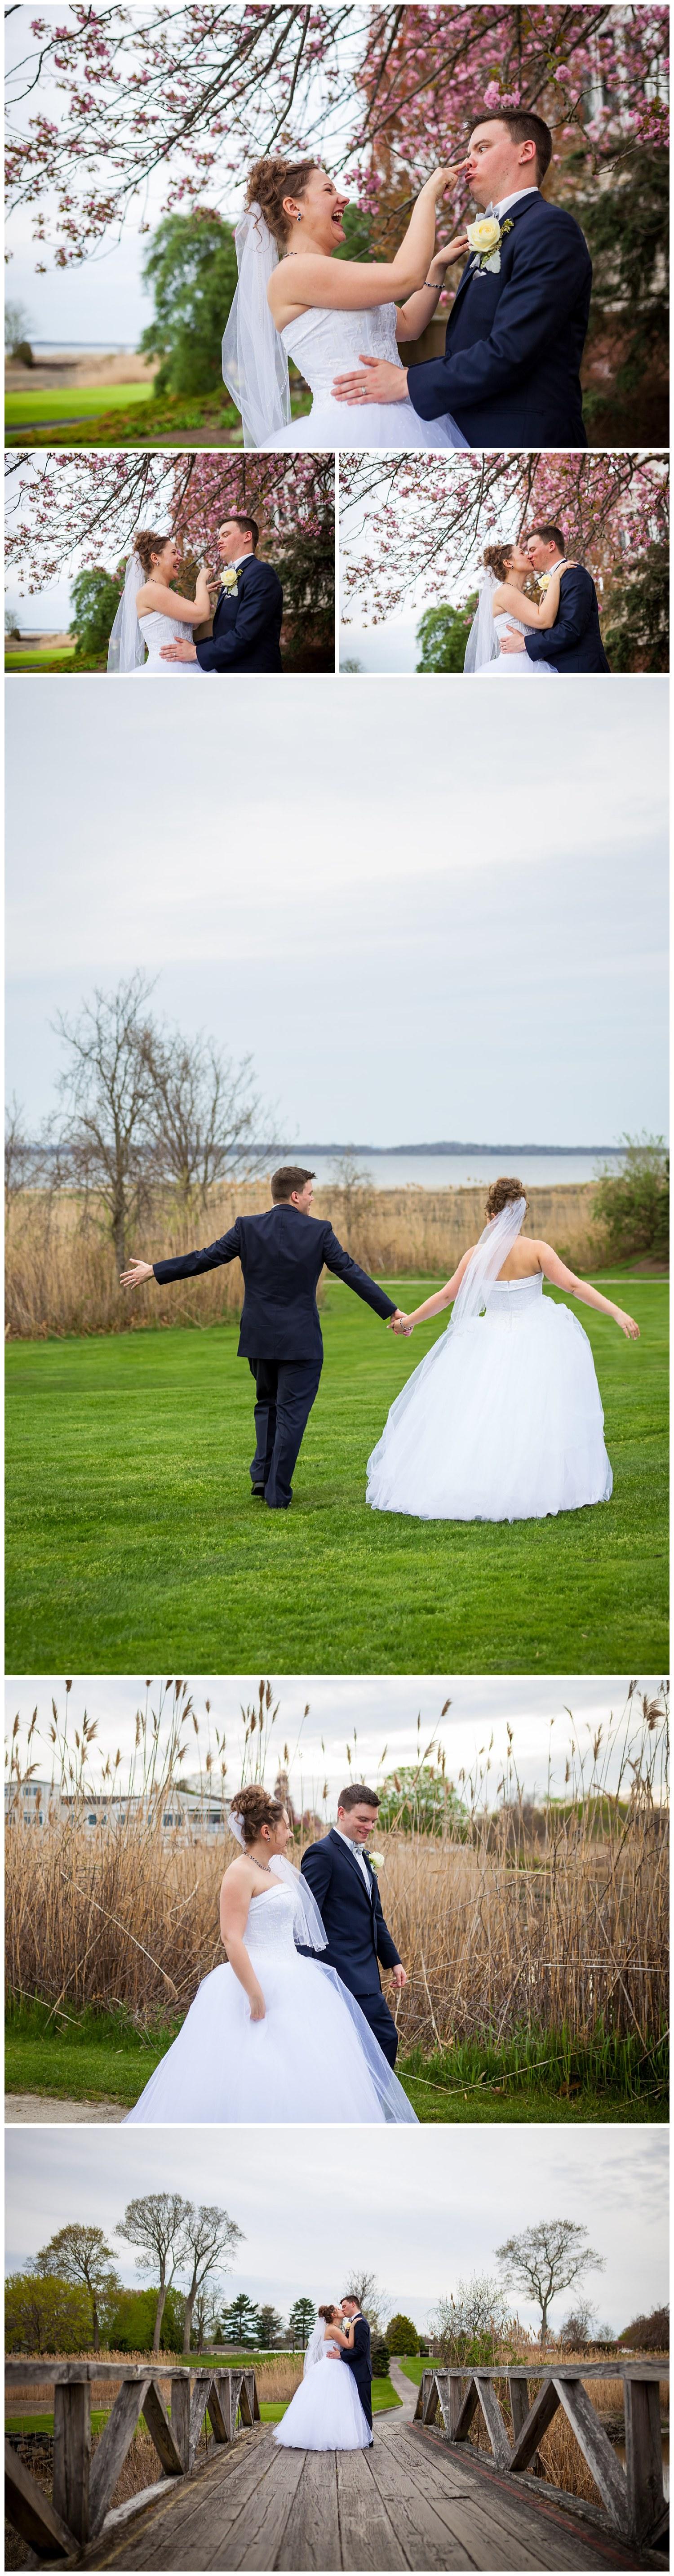 adam-waz-wedding-photographer-north kingstown-ri_0010.jpg